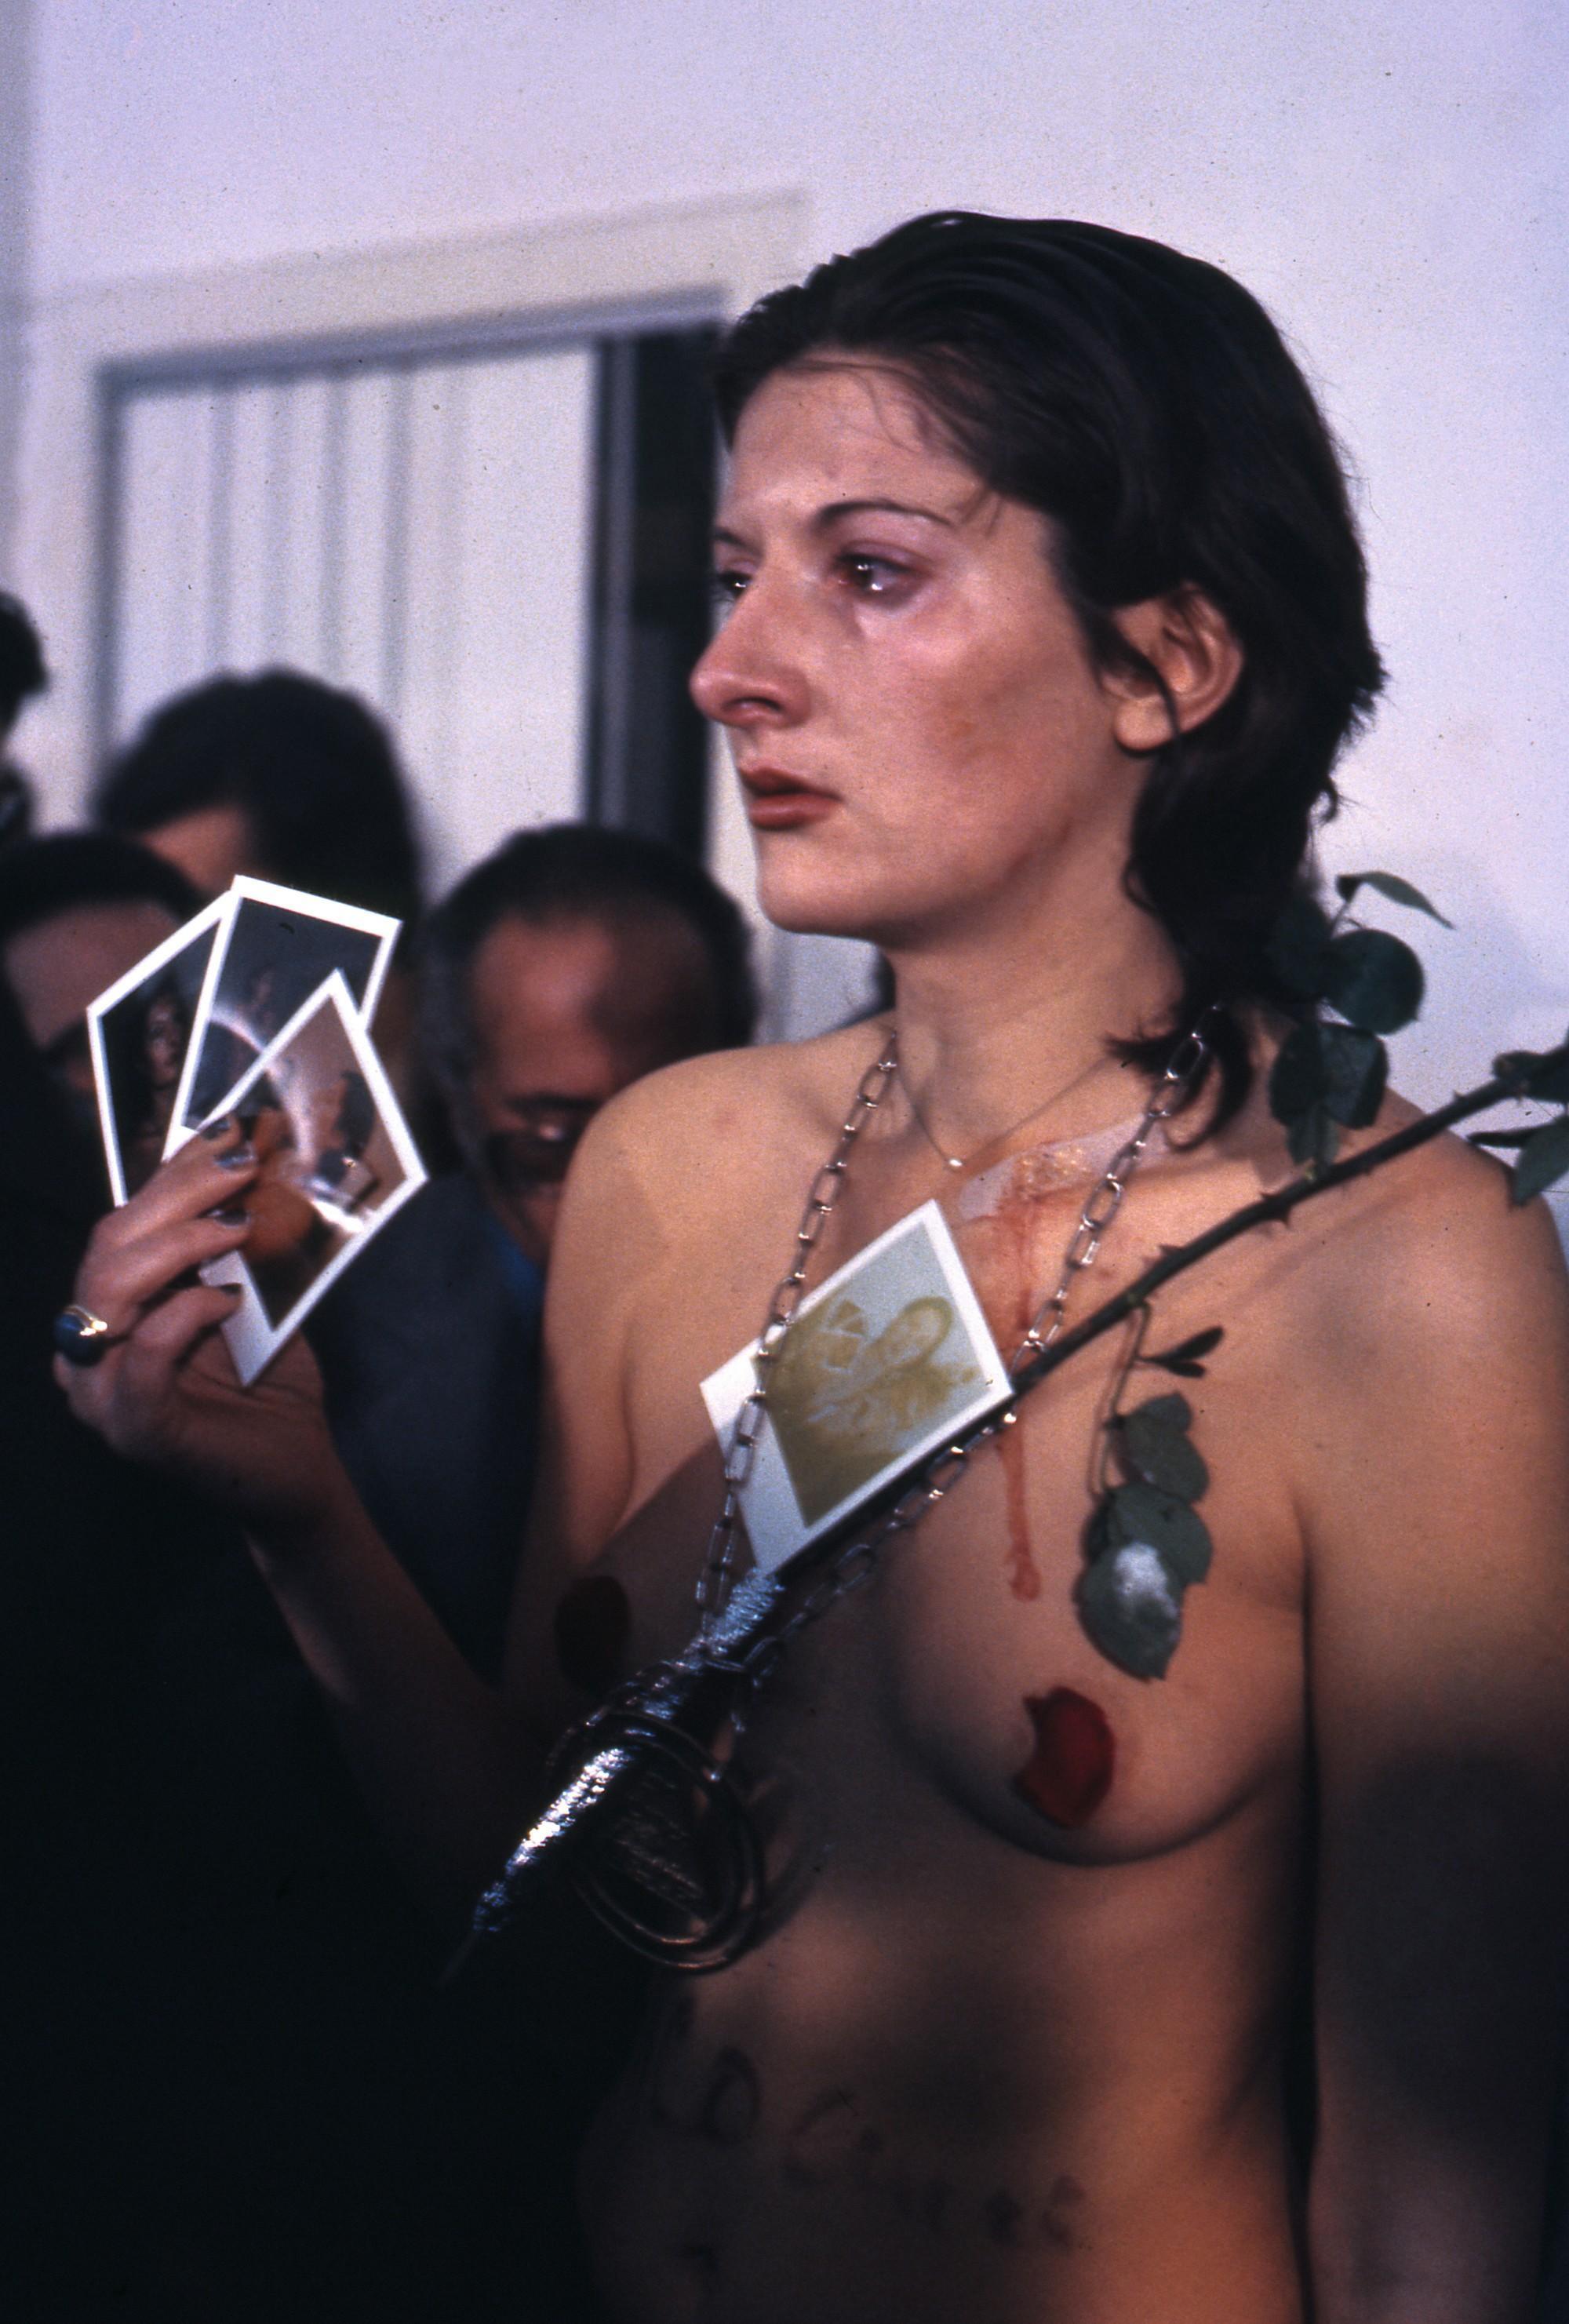 Marina Abramović, Rythm 0, 1974, Studio Morra, Naples.